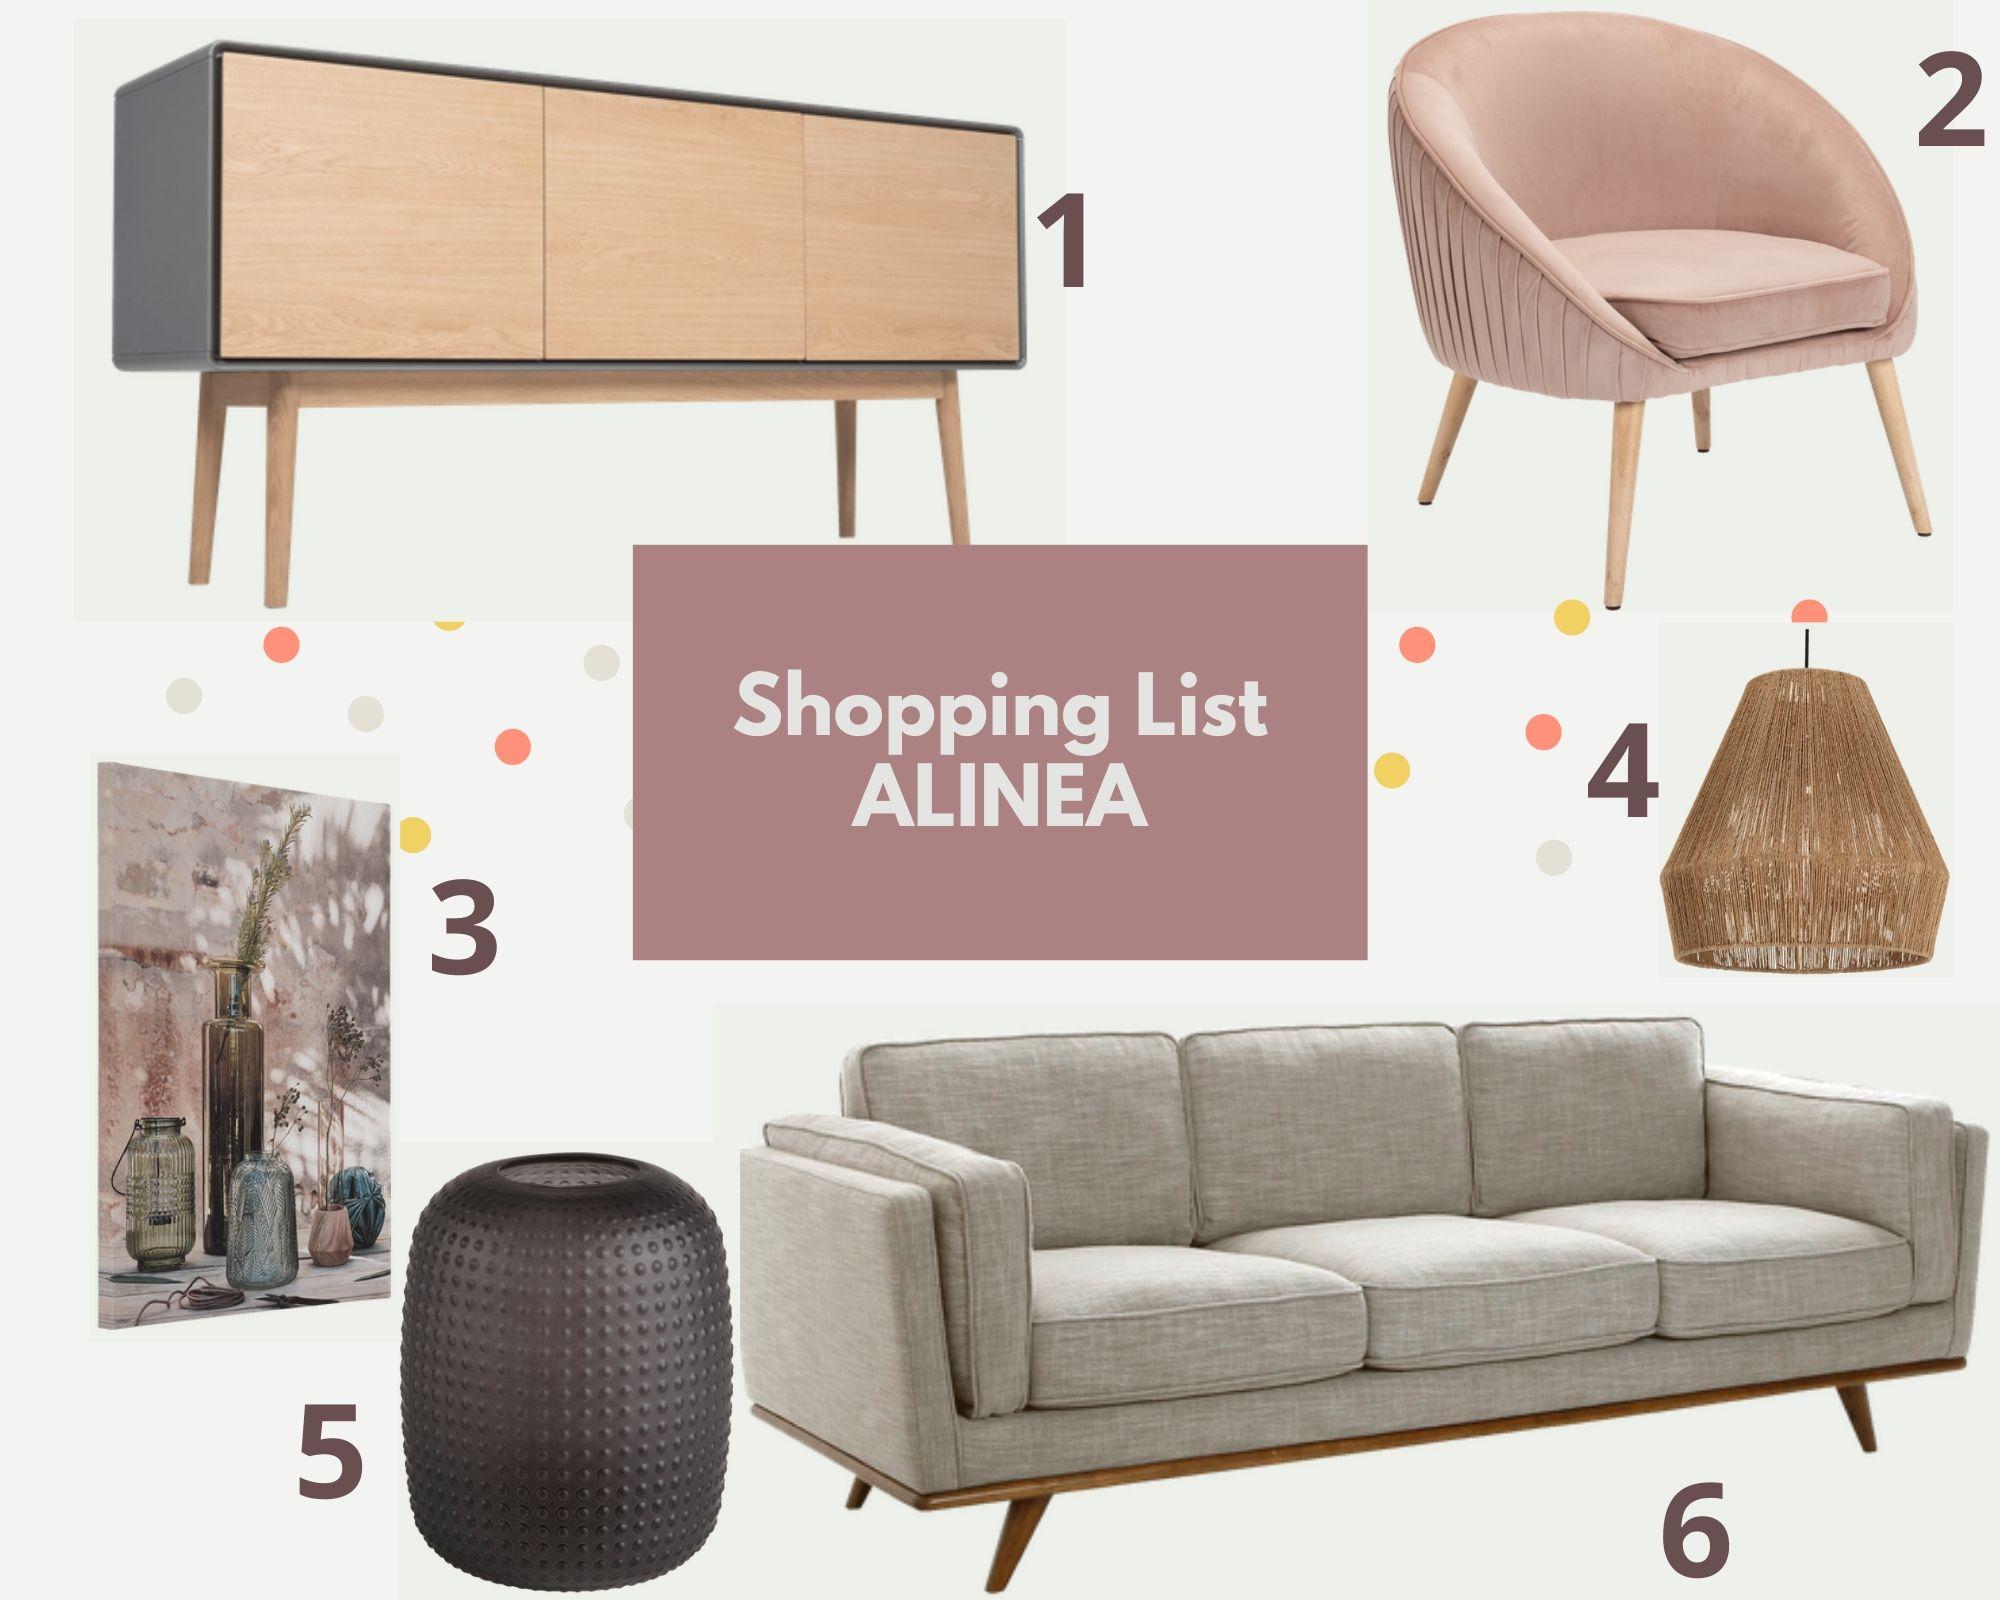 Shopping list alinea